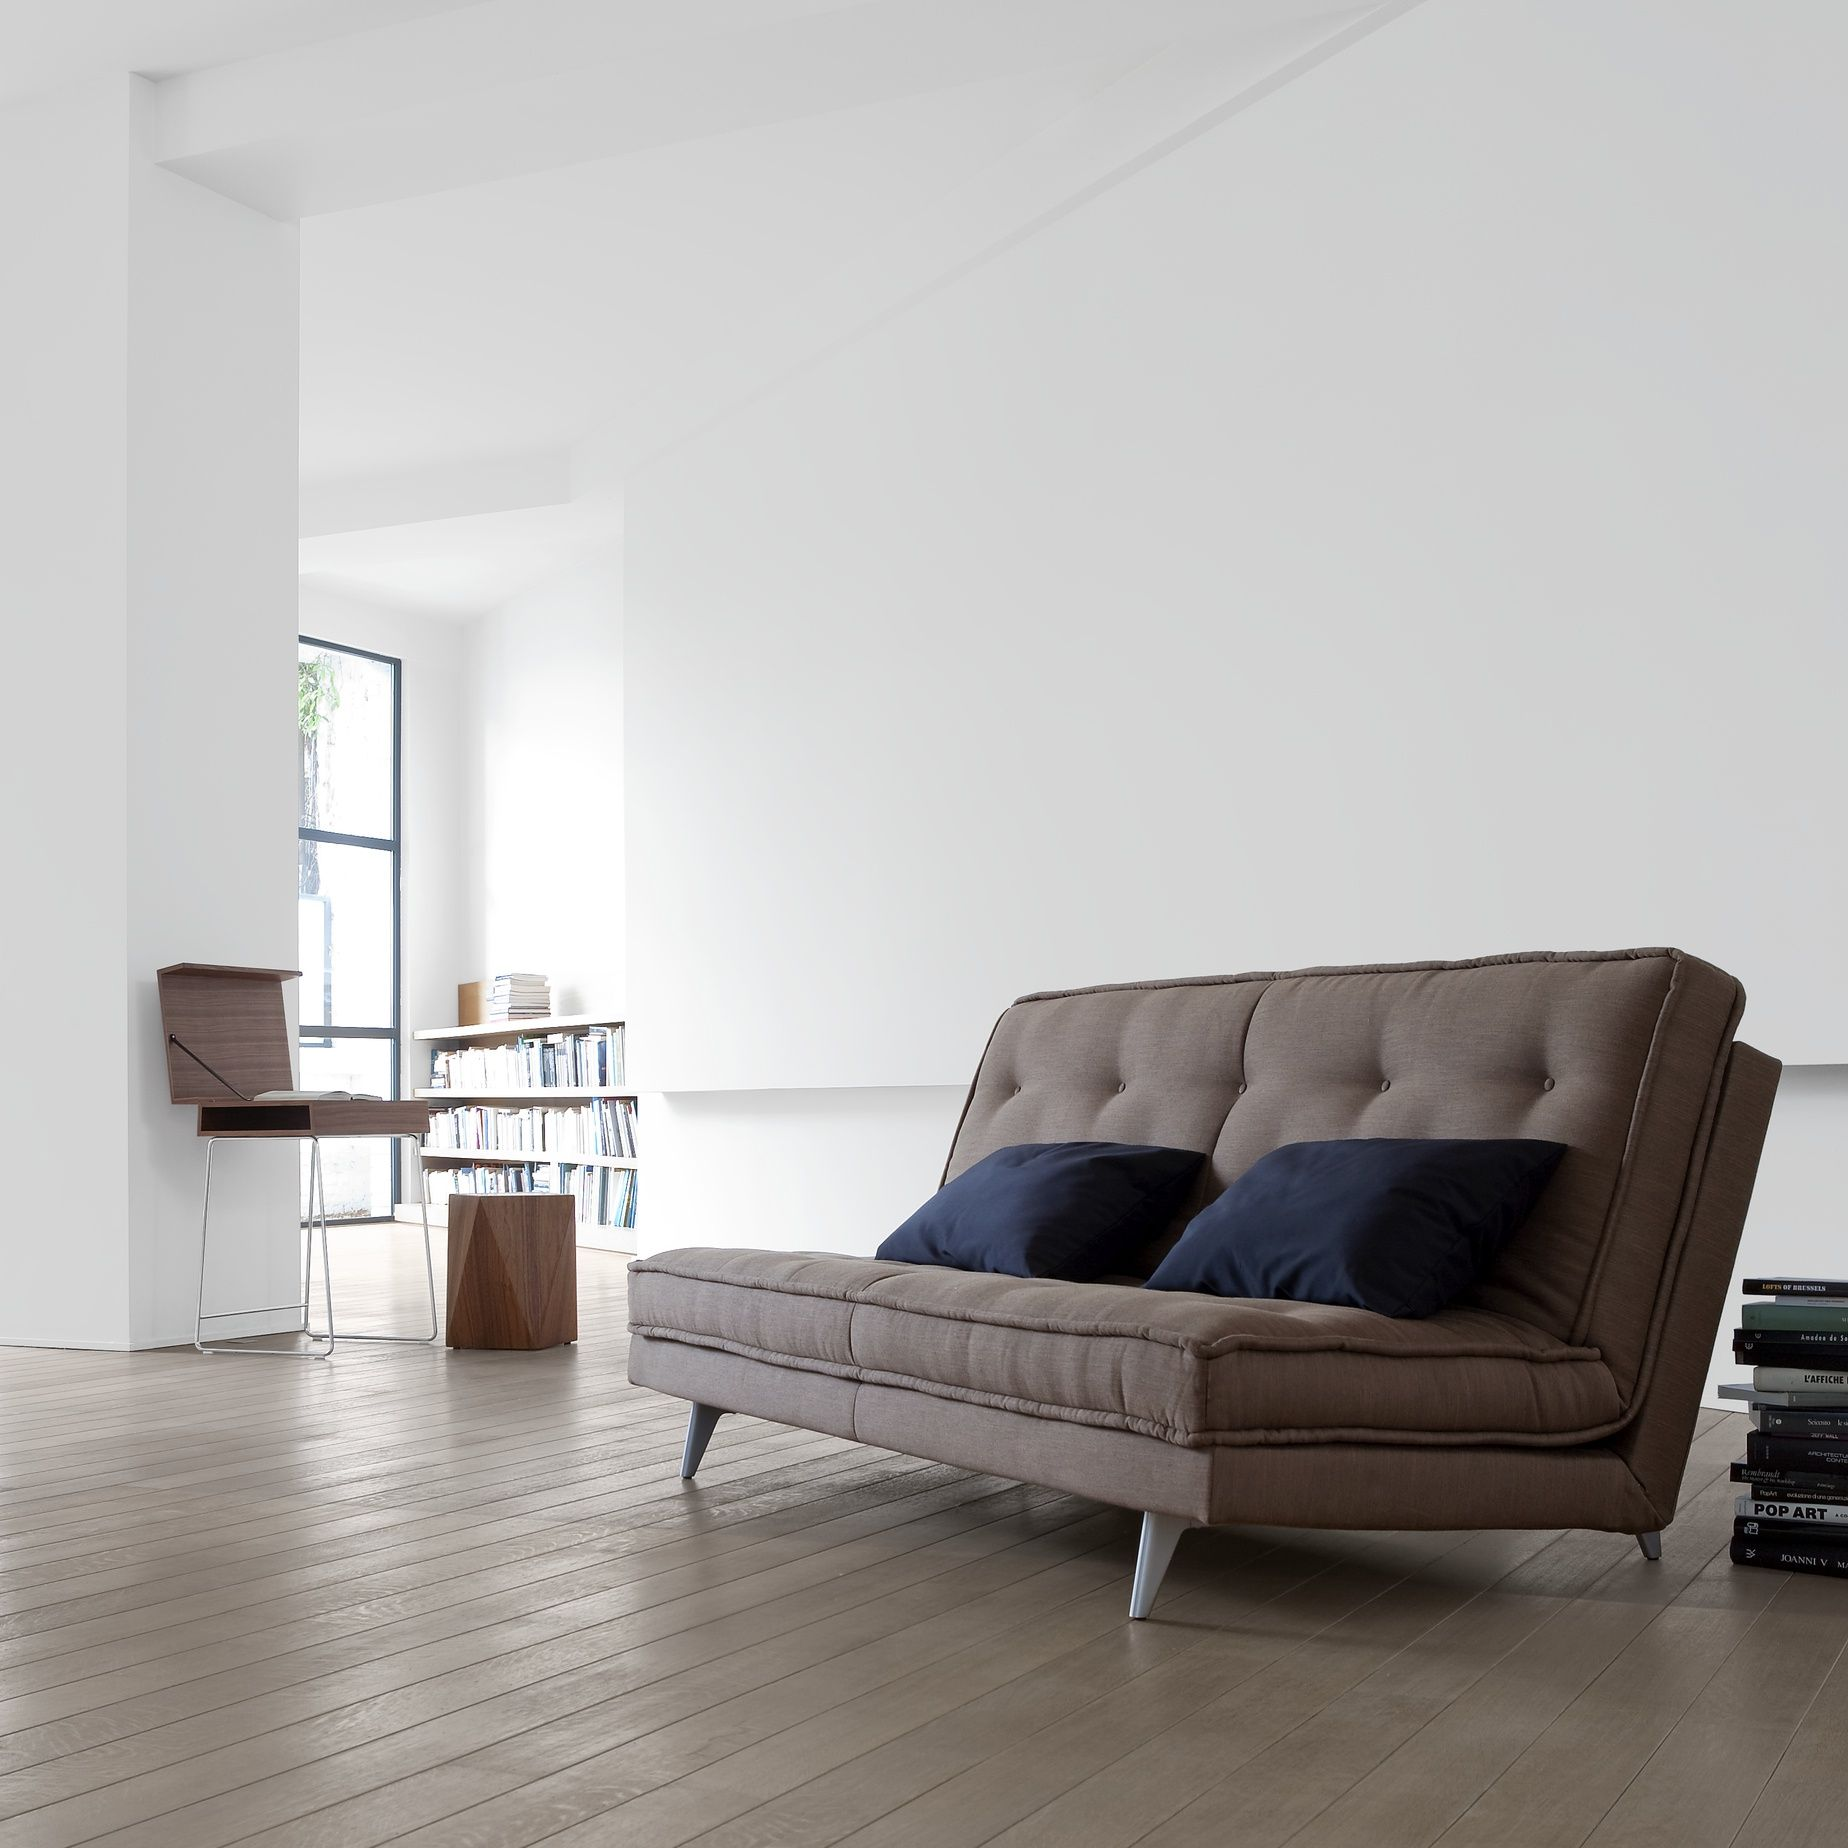 Design Schlafsofa Ligne Roset nomade express sofa beds designer didier gomez ligne roset